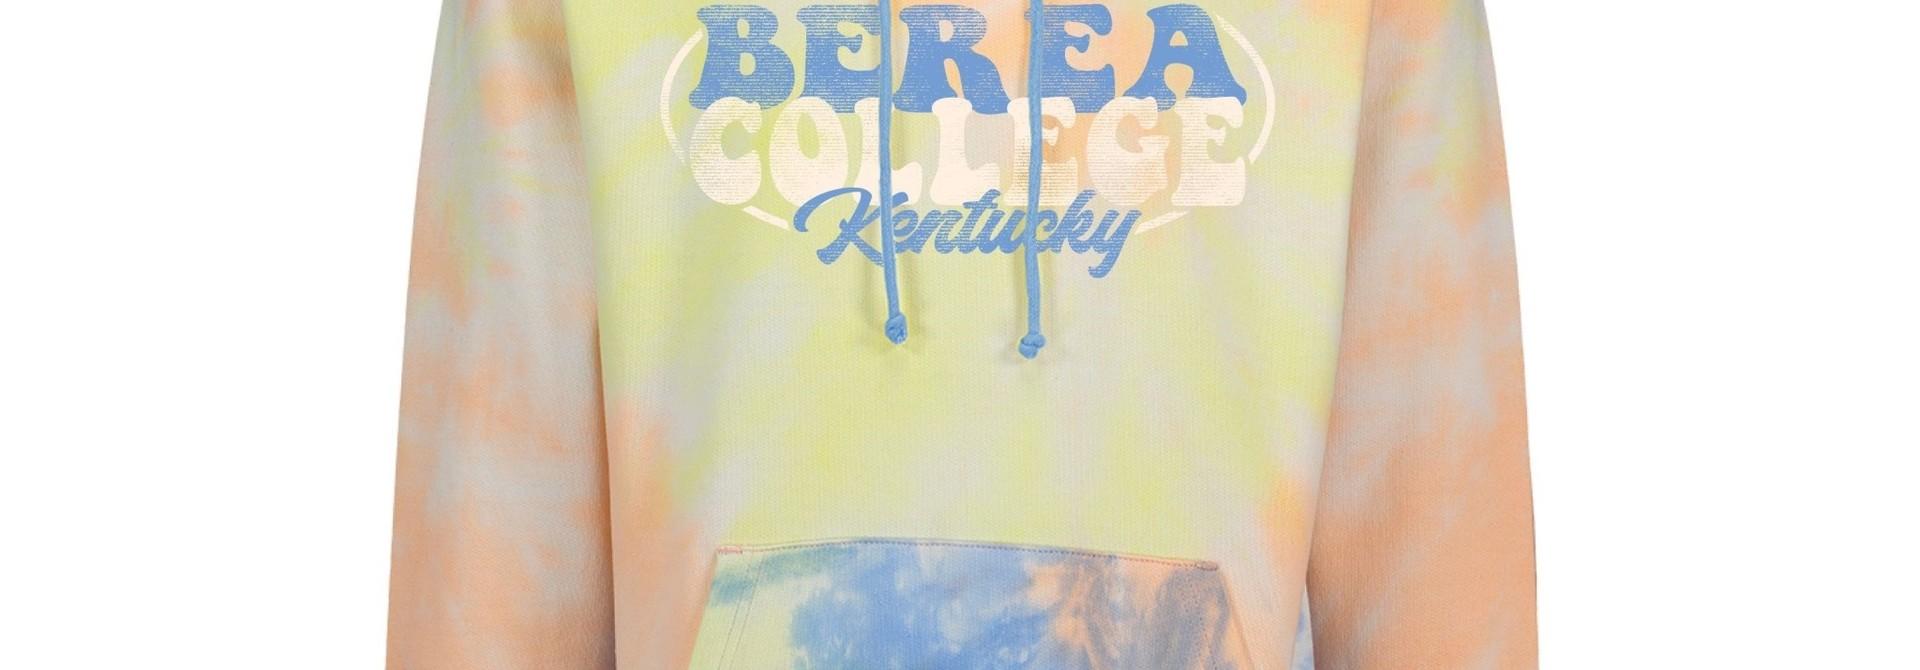 Berea College Est. 1855 Tie-Dye Sunrise Hoodie